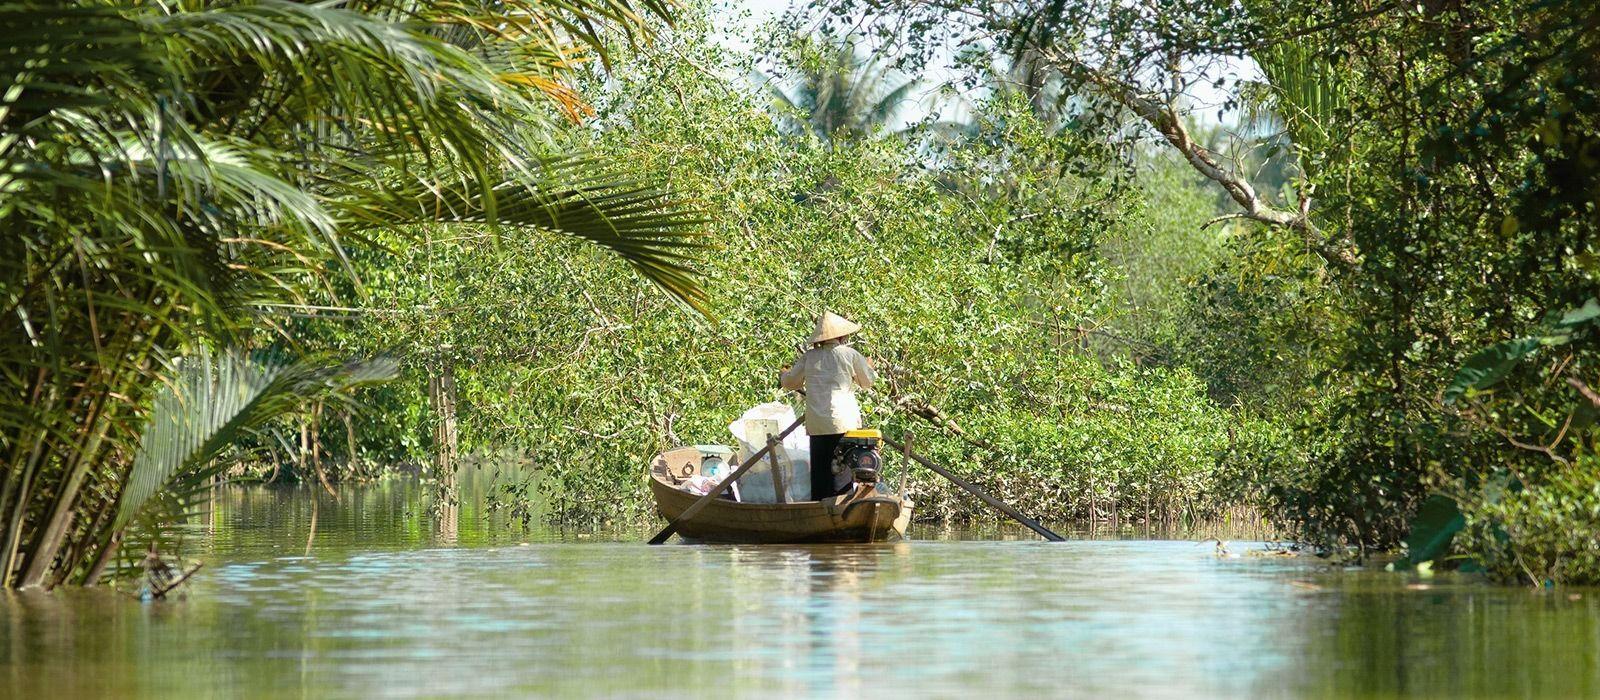 Rundreise Vietnam Kambodscha – Mekong & mehr Urlaub 5